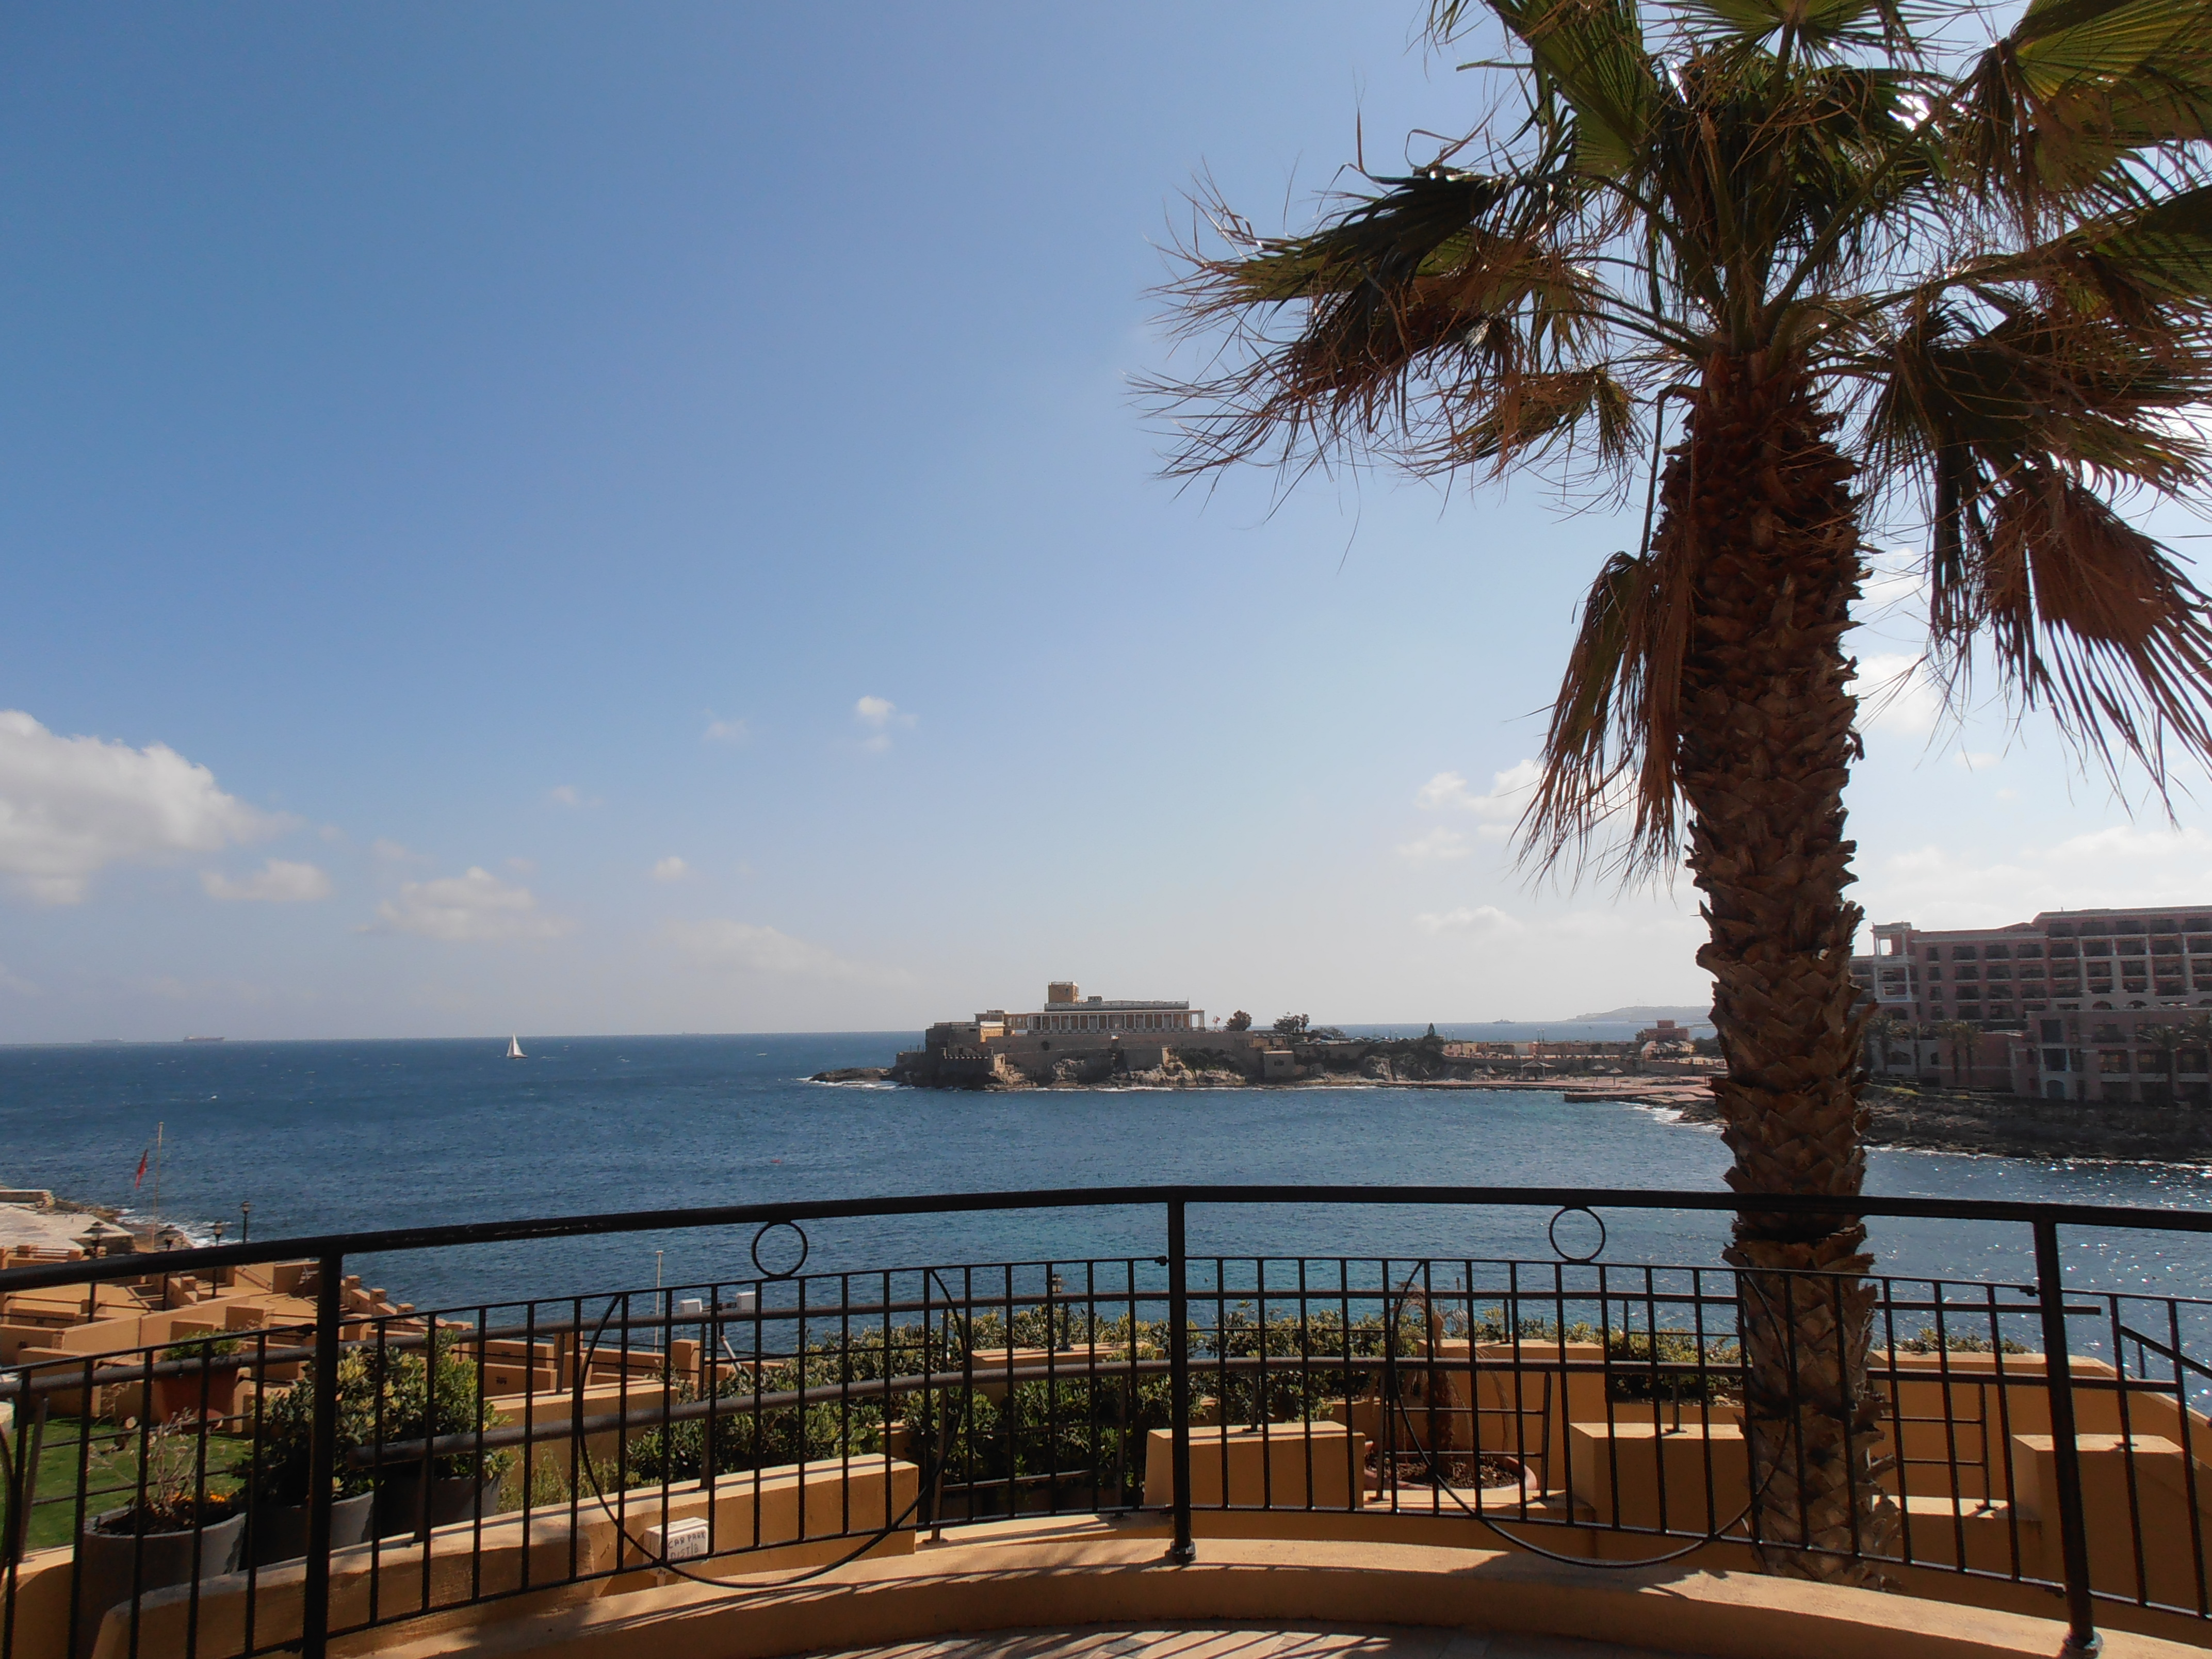 Malta Feb 2012 016